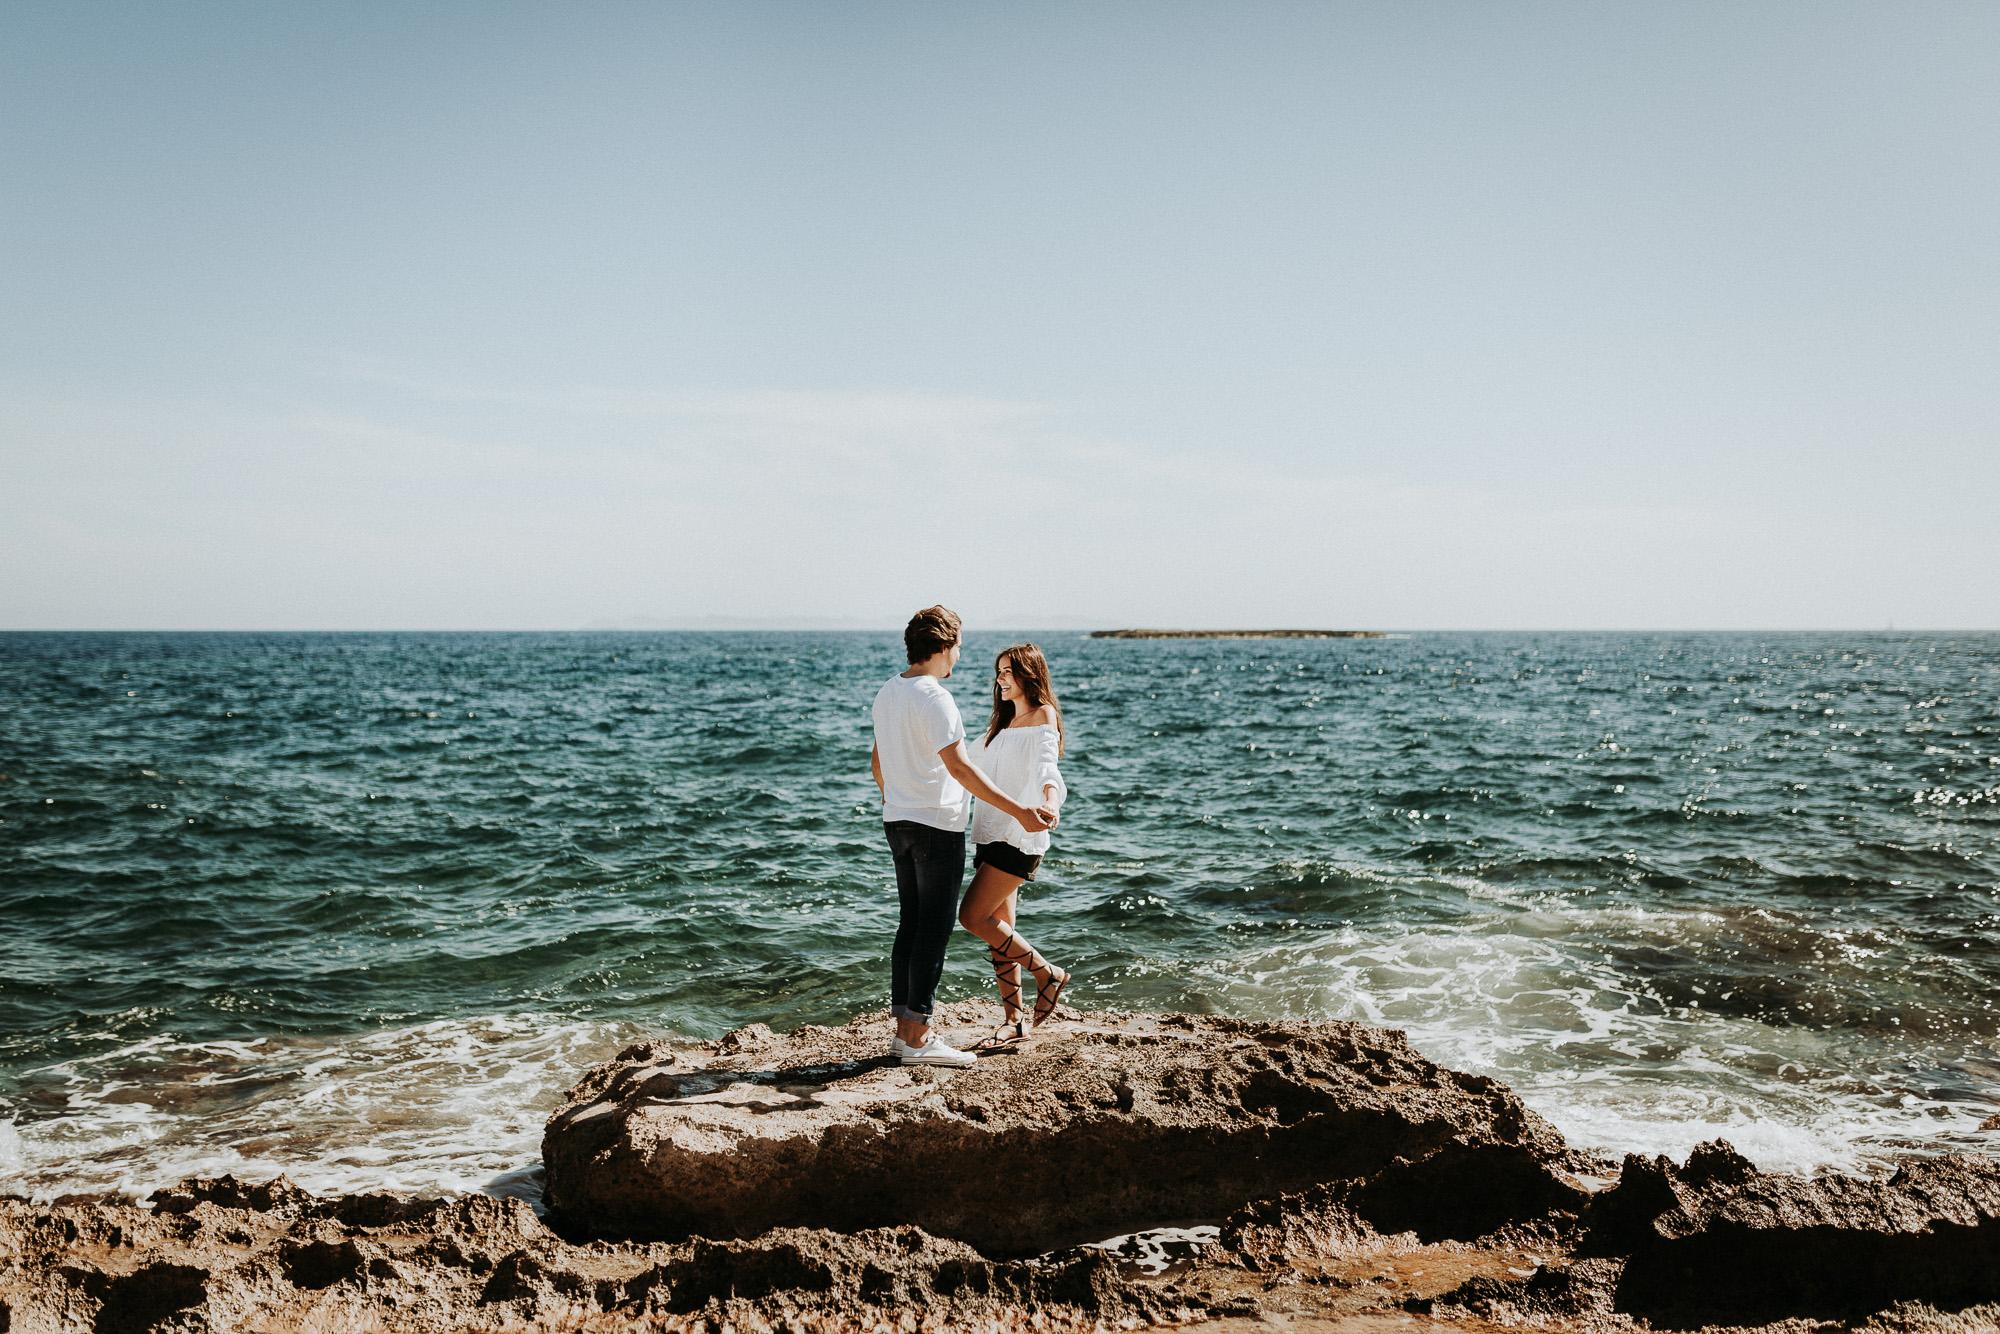 DanielaMarquardtPhotography_wedding_elopement_mallorca_spain_stjordi_sessalines_marinaandxavi157